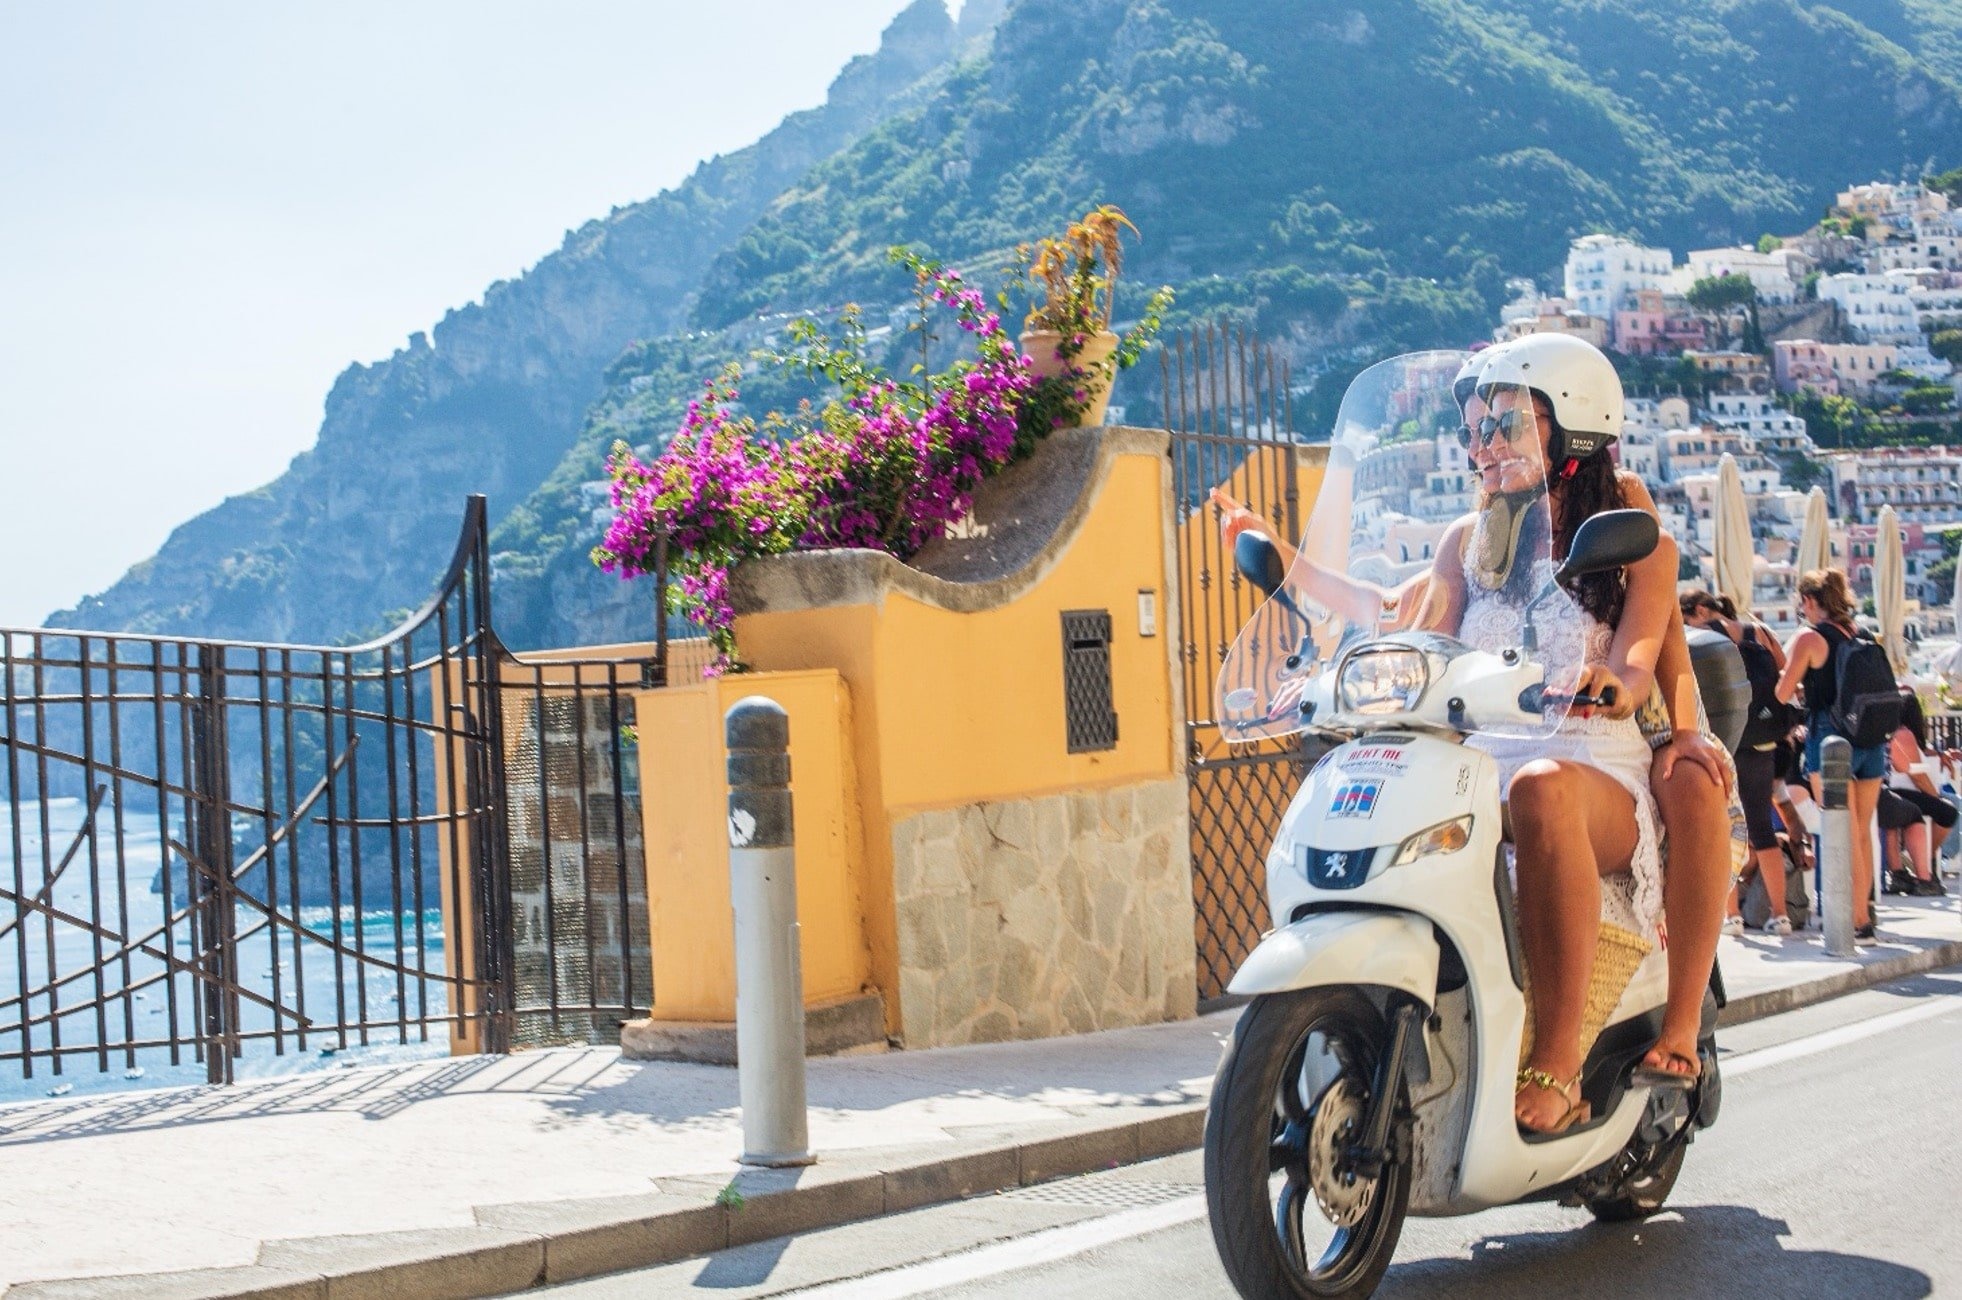 Come noleggiare scooter amalfi